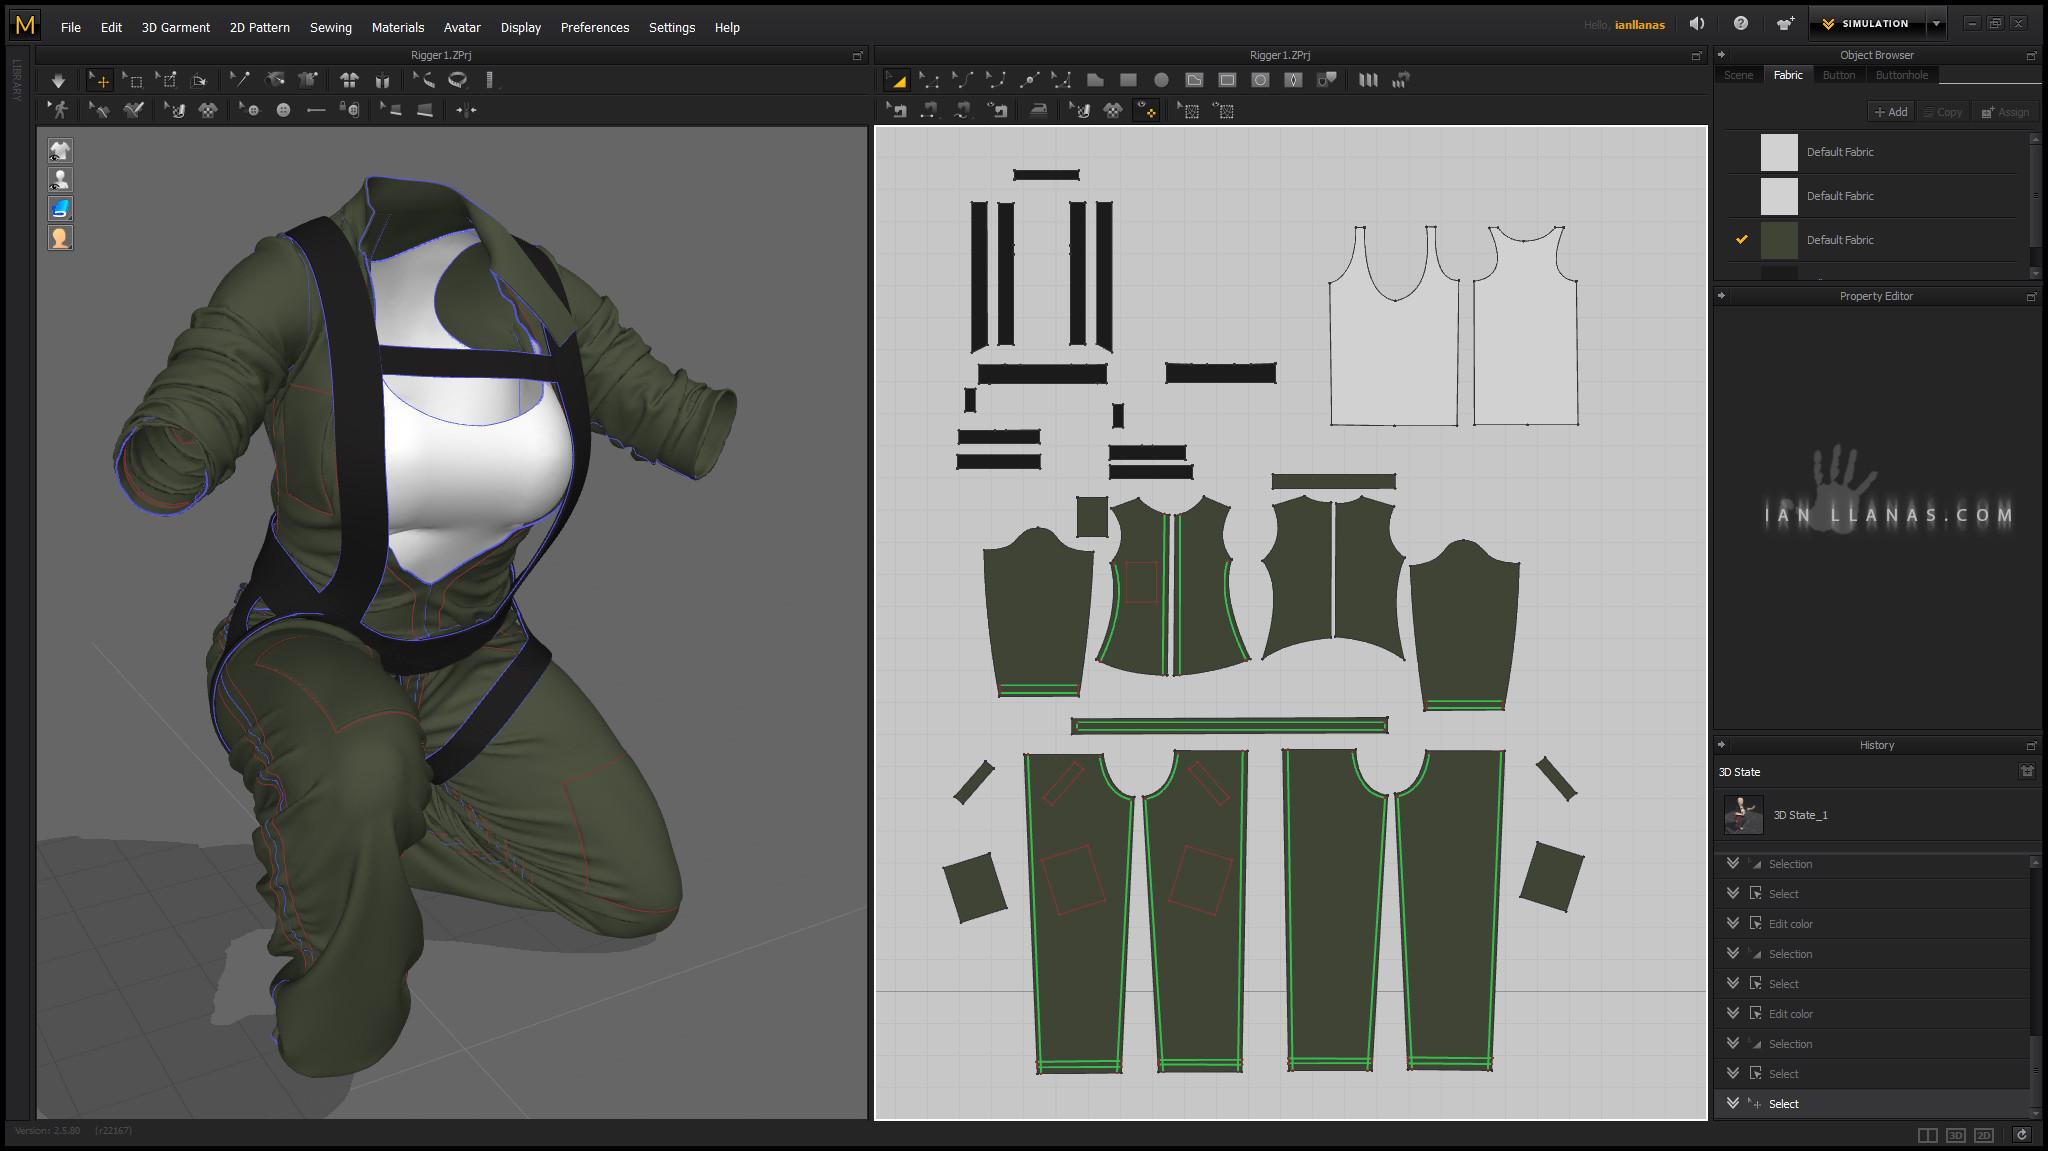 Marvelous Designer layout